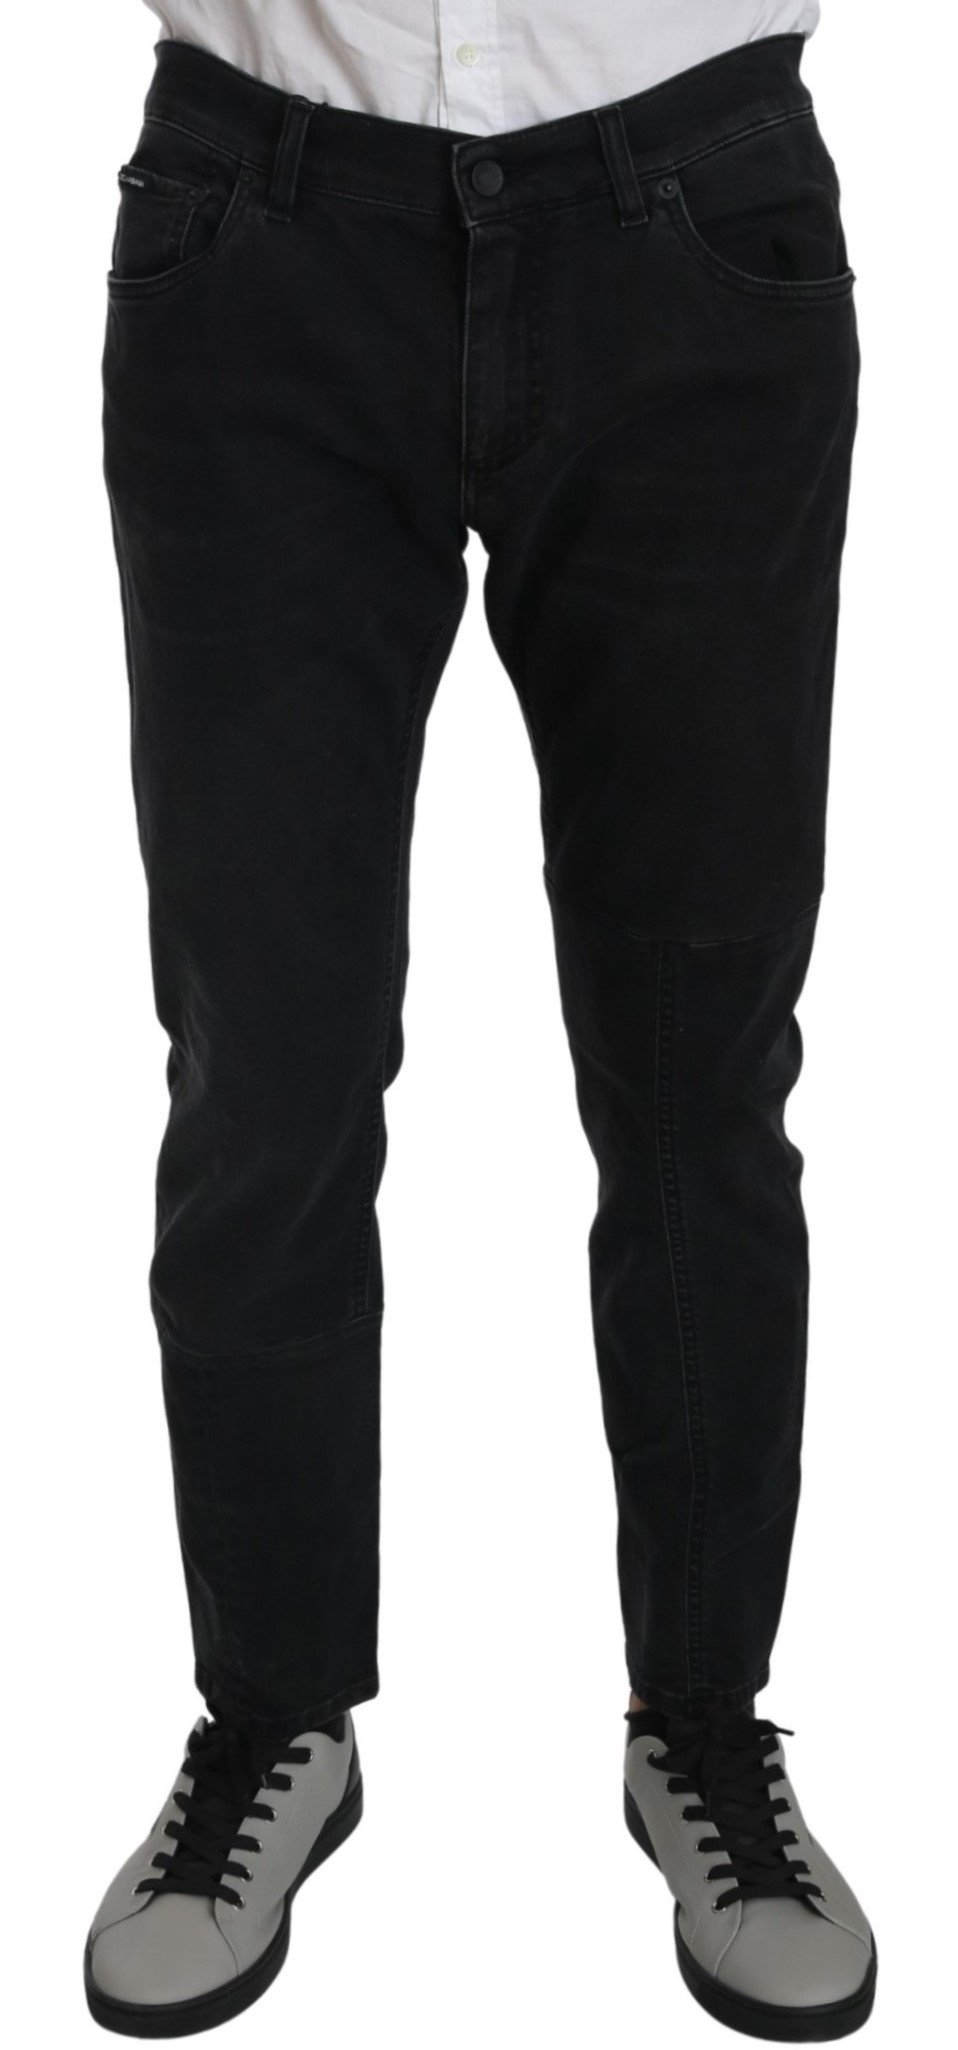 Dolce & Gabbana Men's Cotton Stretch Skinny Slim Fit Jeans Black PAN70882 - IT50   L